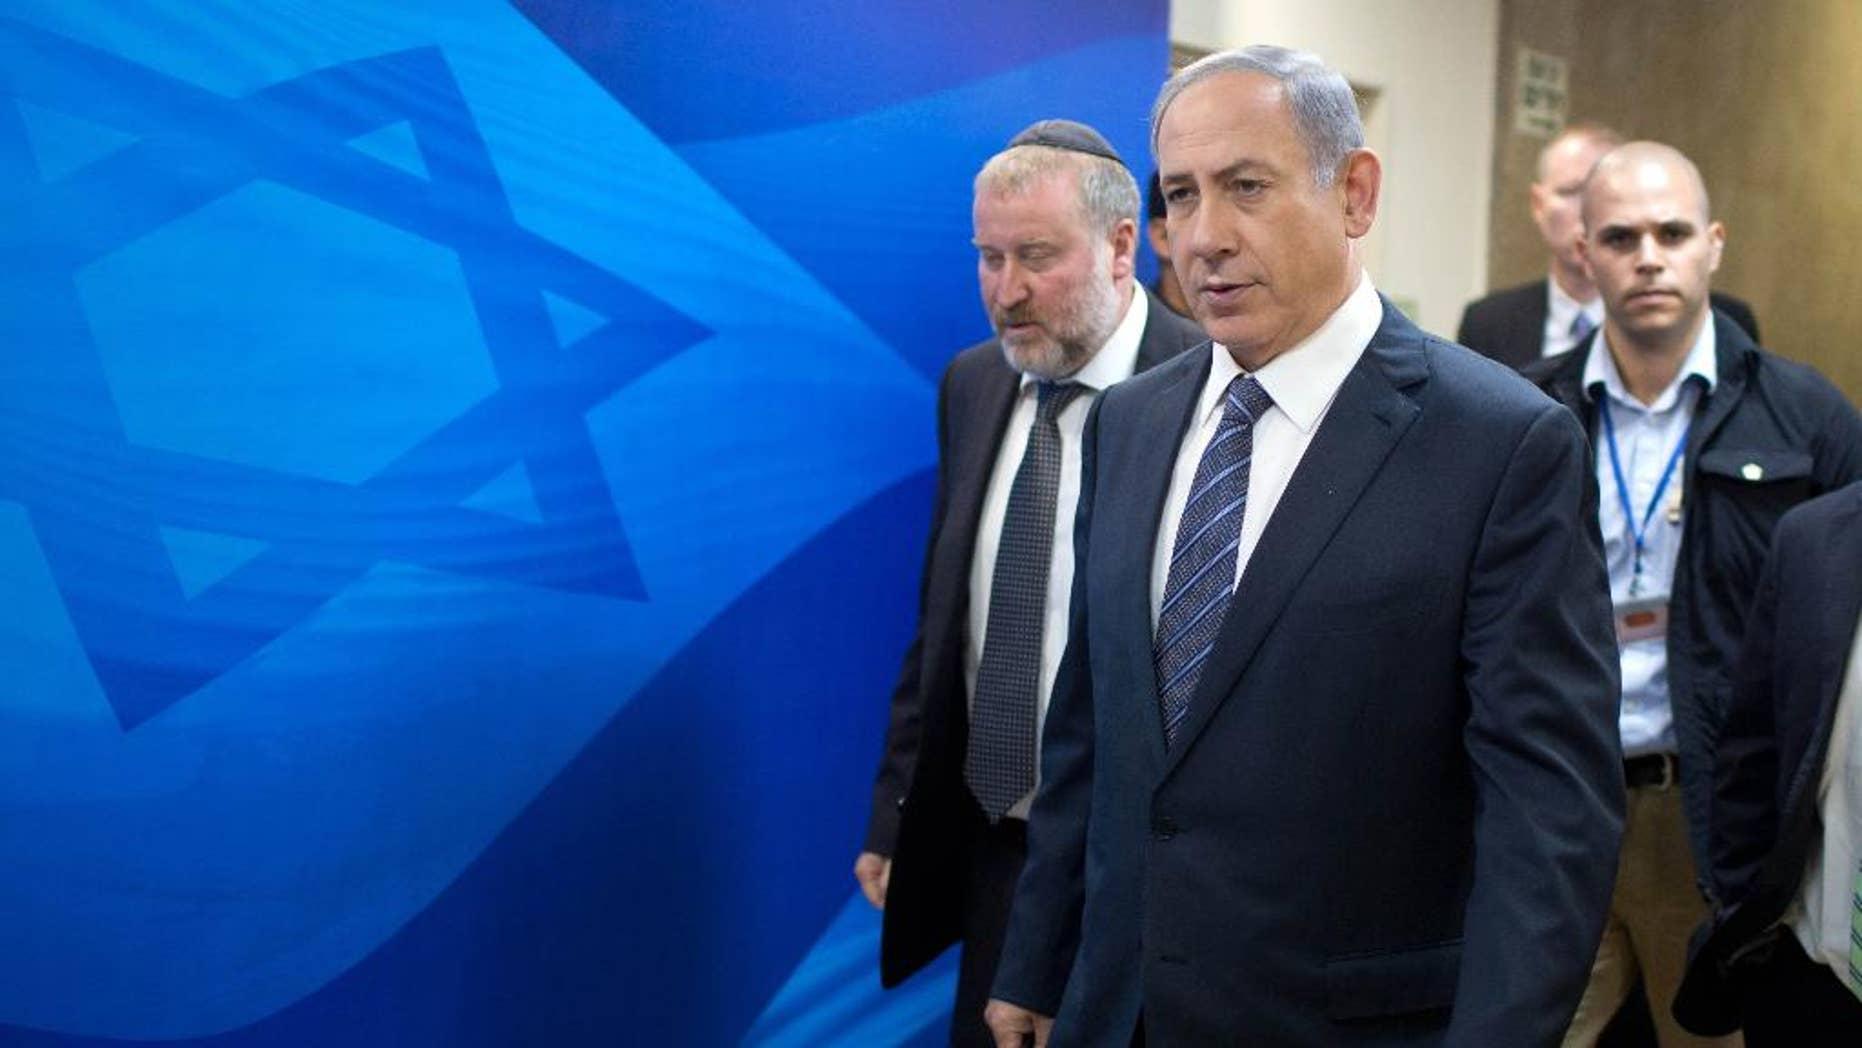 Israeli Prime Minister Benjamin Netanyahu, second left, and Cabinet Secretary, Avichai Mandelblit, left, arrive for the the weekly cabinet meeting at the prime minister's office in Jerusalem, Sunday, Sept. 6, 2015. (Menahem Kahana/Pool photo via AP)